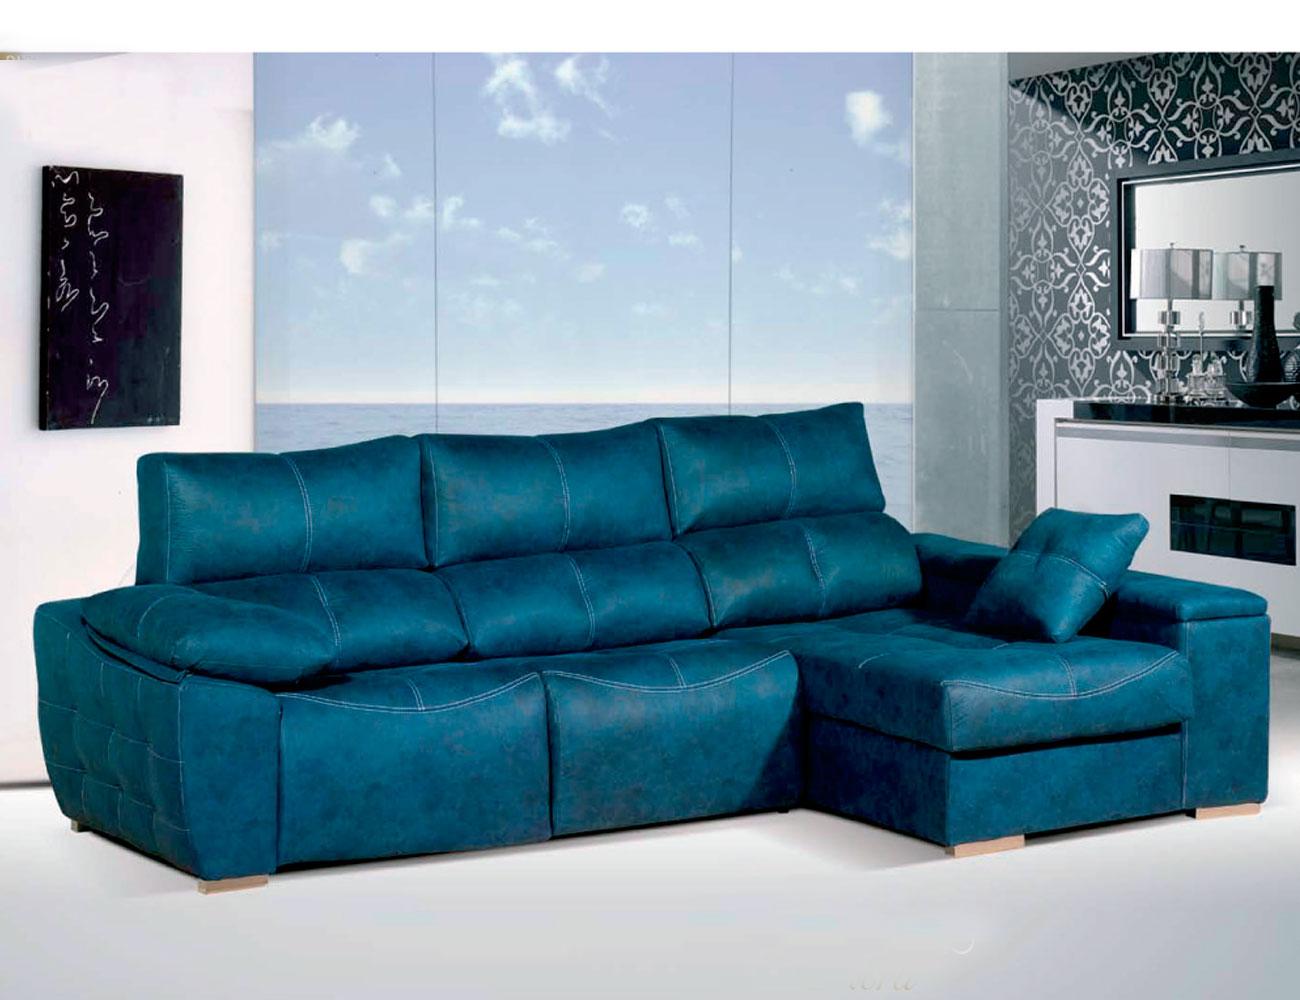 Sofa chaiselongue relax 2 motores anti manchas turquesa5